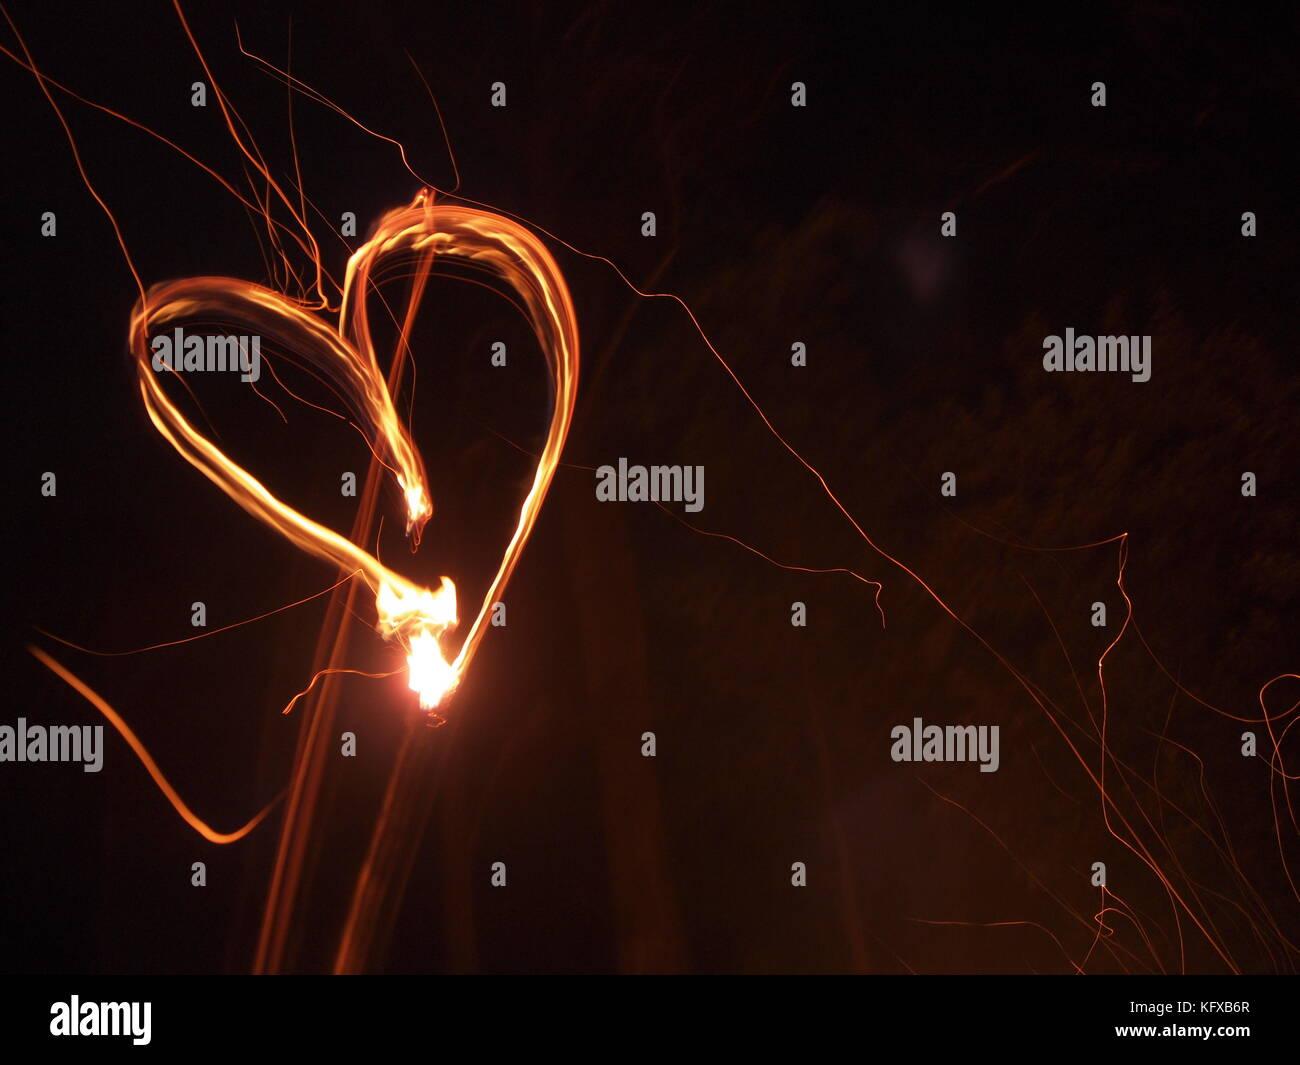 Cuore incandescente al buio Foto Stock